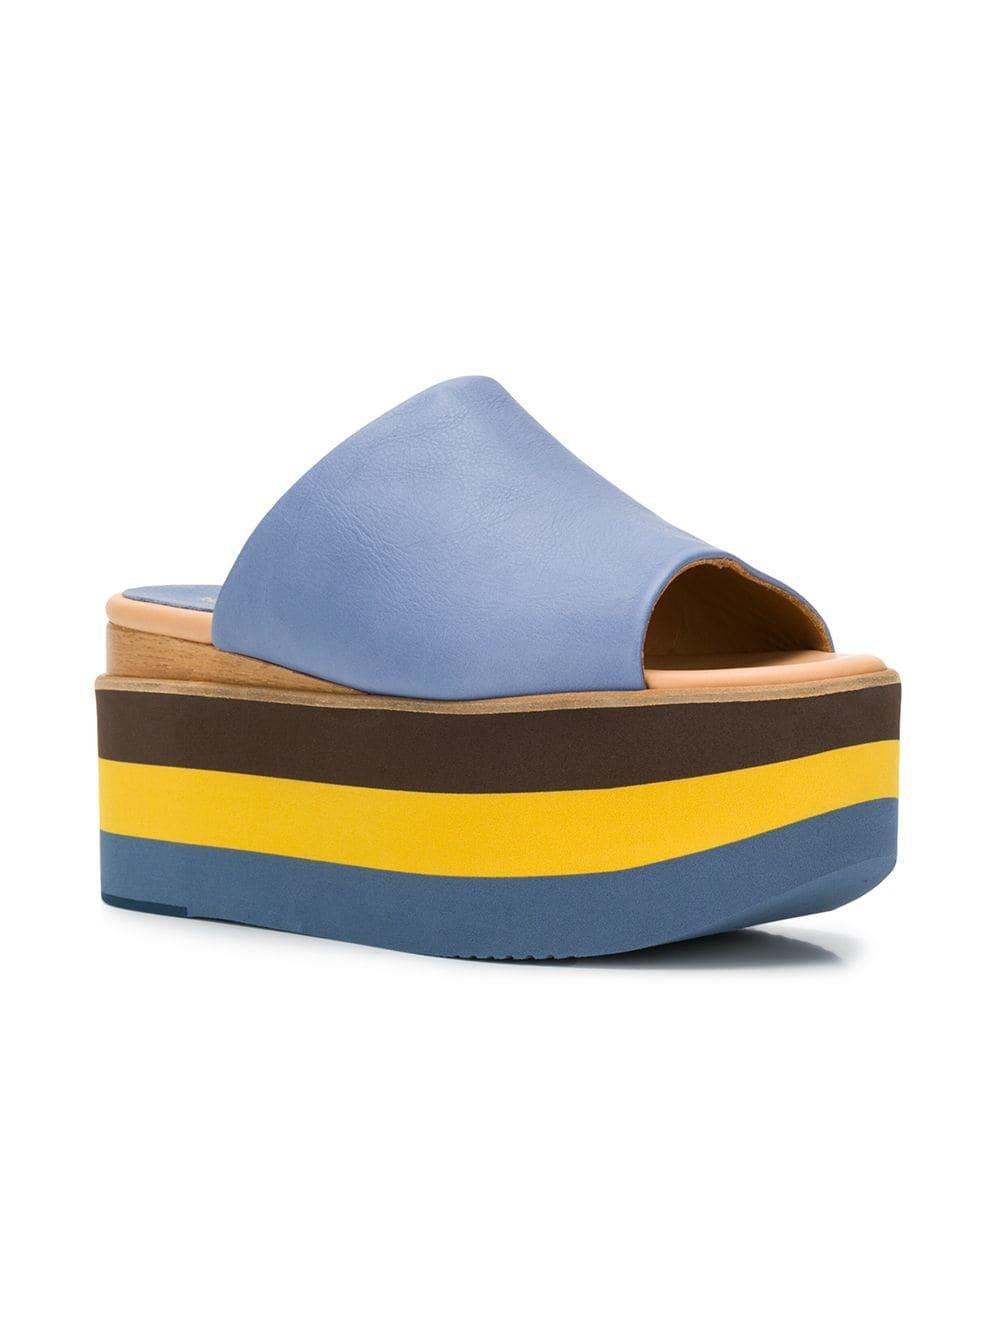 60ca2011fcba Lyst - Paloma Barceló Aiko Platform Sandals in Blue